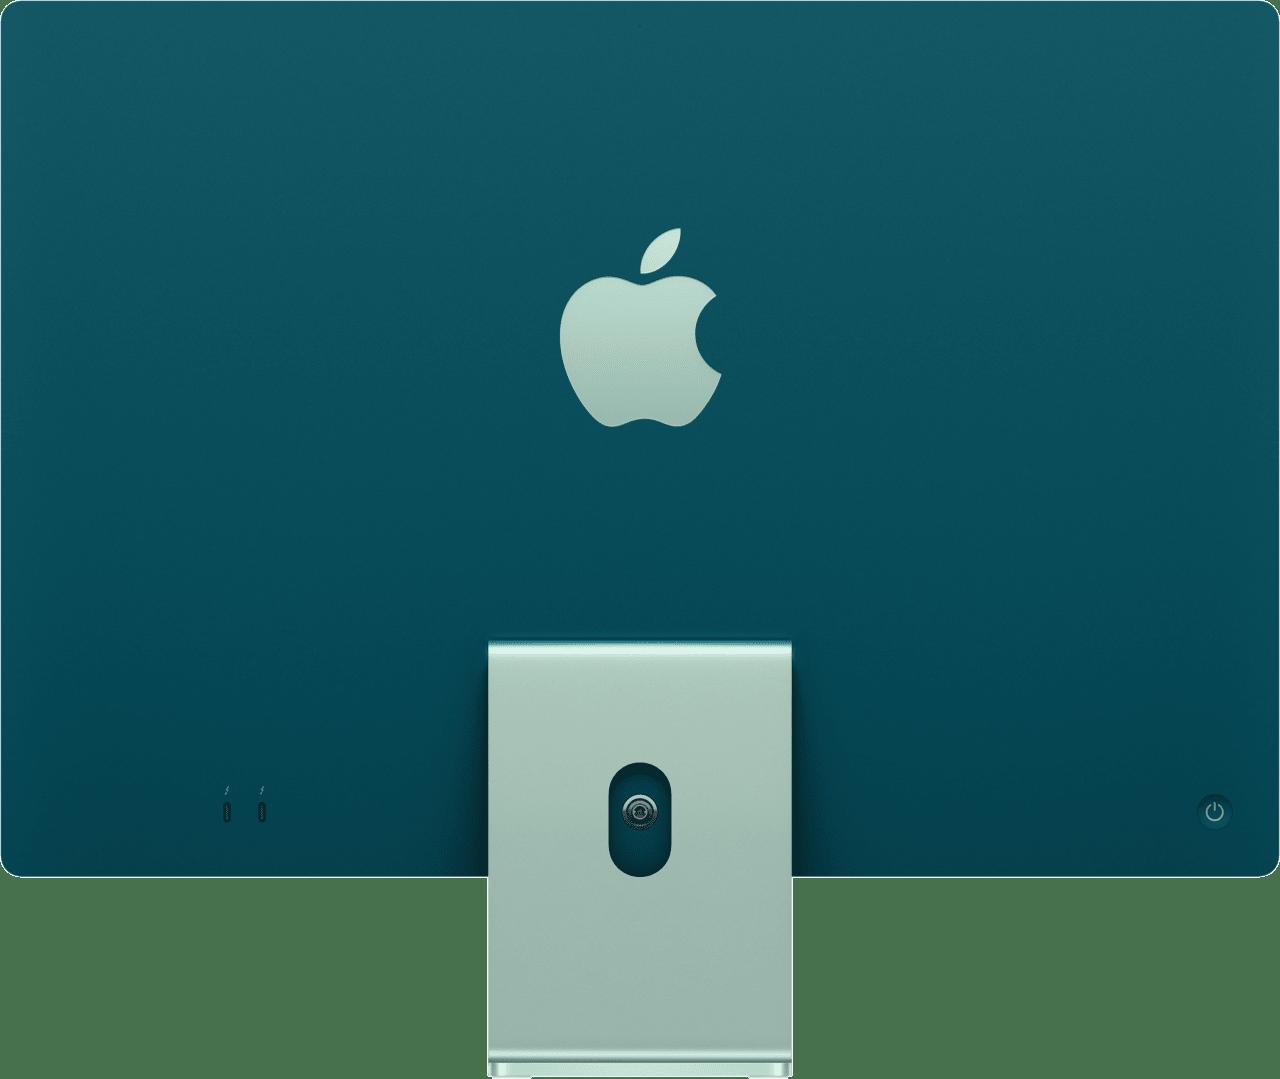 "Green Apple 24"" iMac (Mid 2021) All-in-One - Apple M1 - 8GB - 256GB SSD - Apple Integrated 7-core GPU.3"